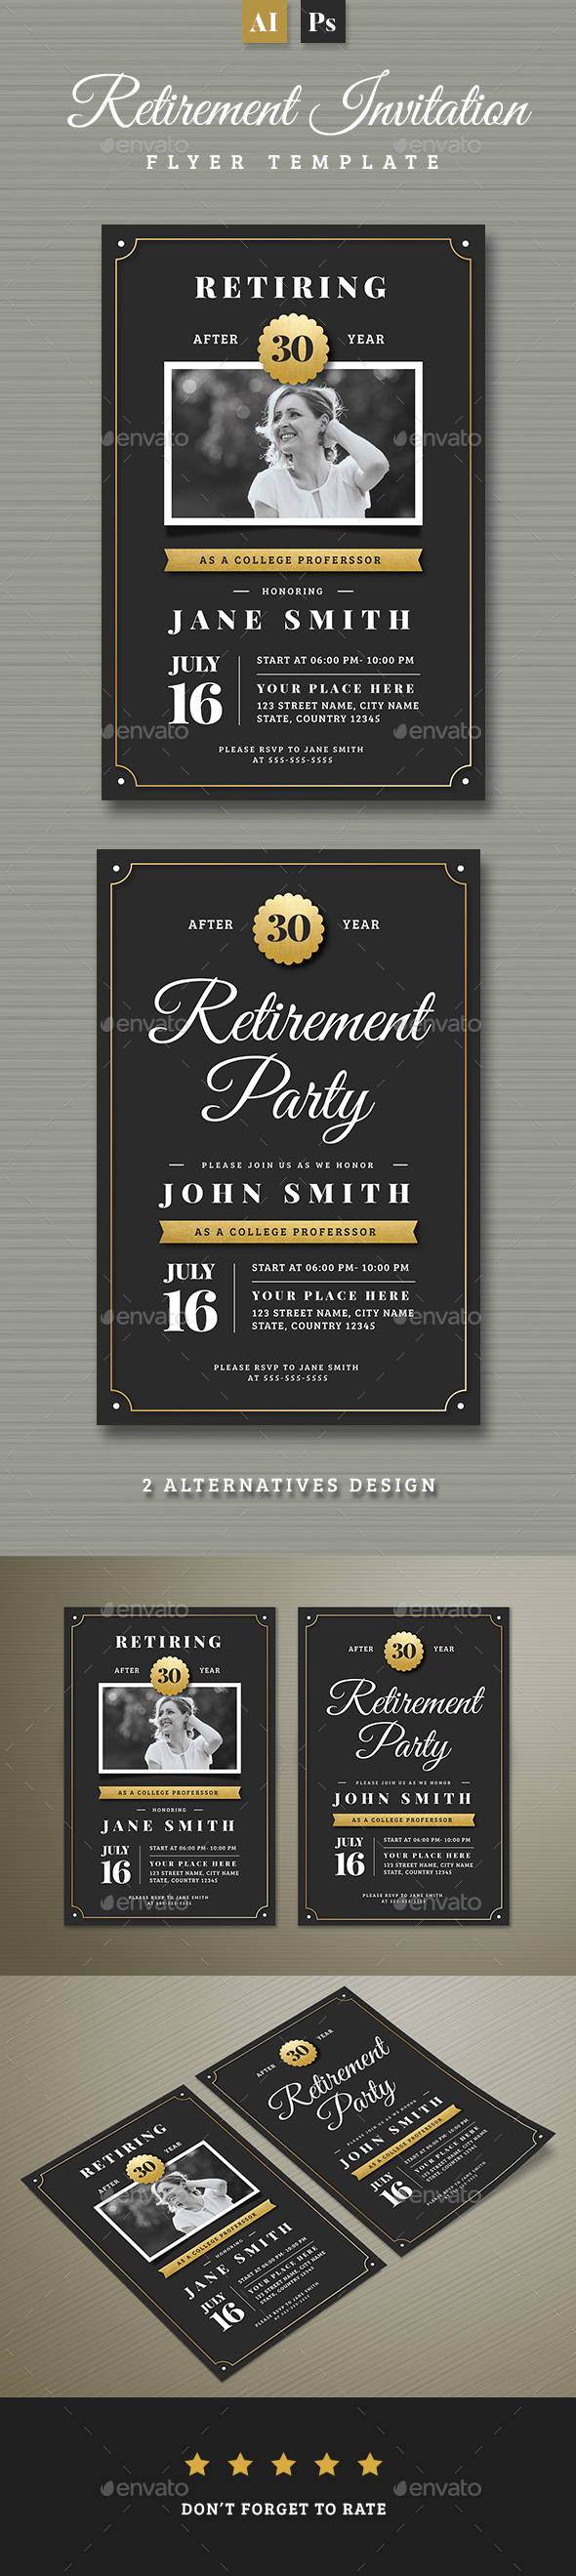 Gold Retirement Invitation Flyer Templates - Invitations Cards & Invites